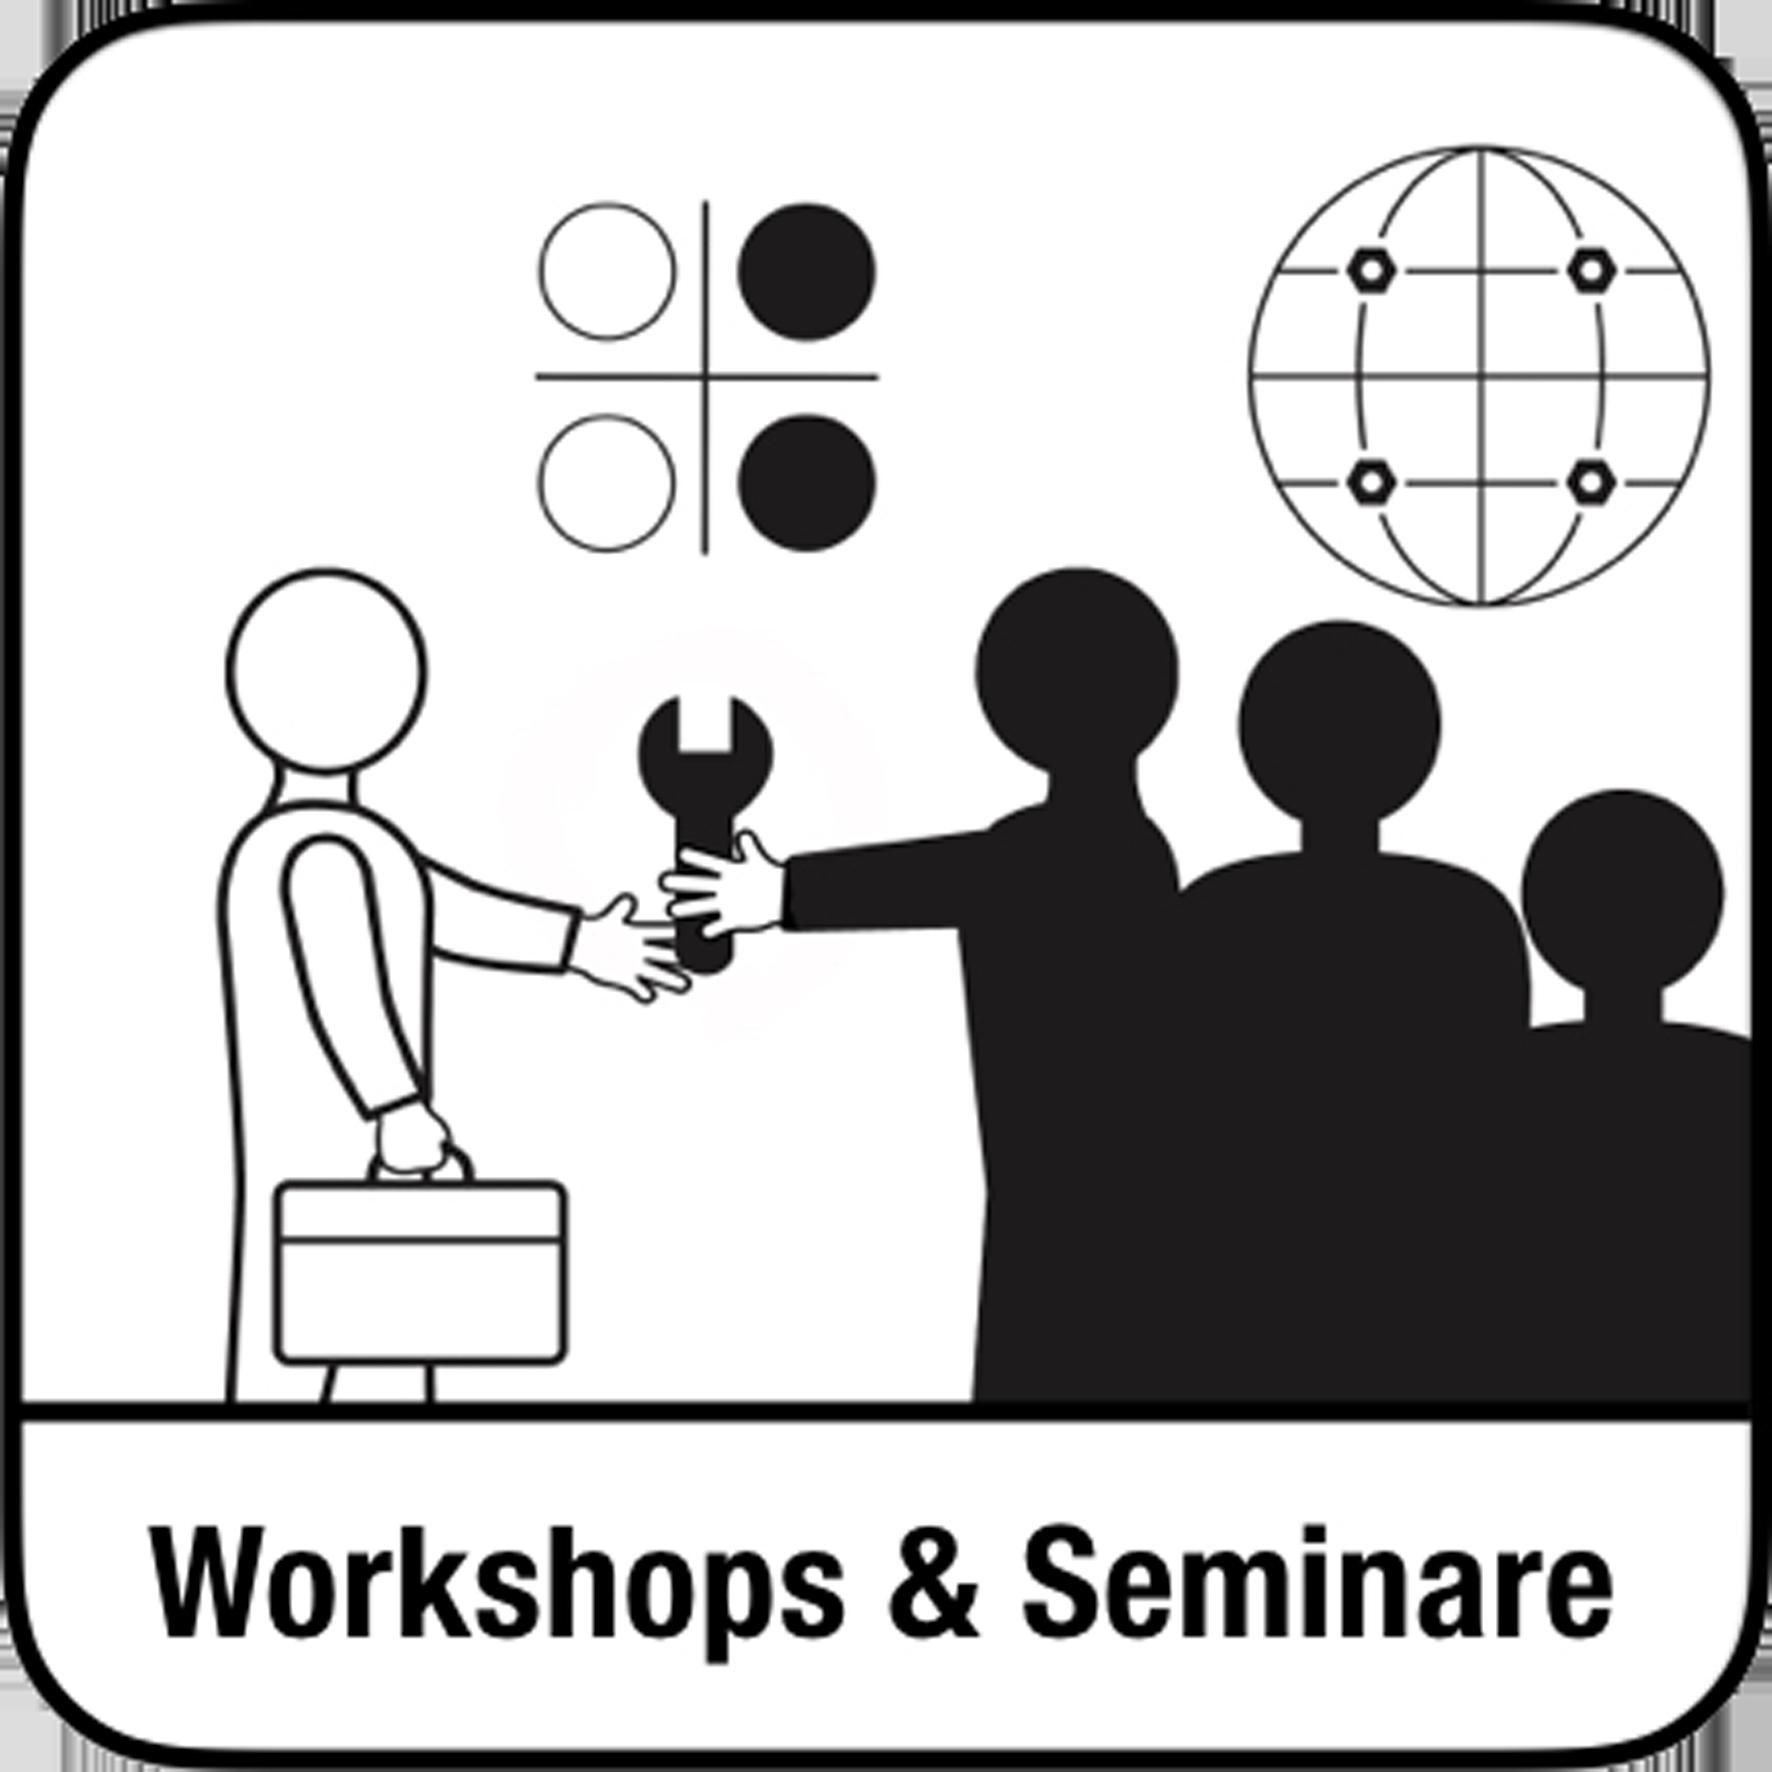 flowinconcept-Angebote-piktogramm-workshops-seminare-15x15.png